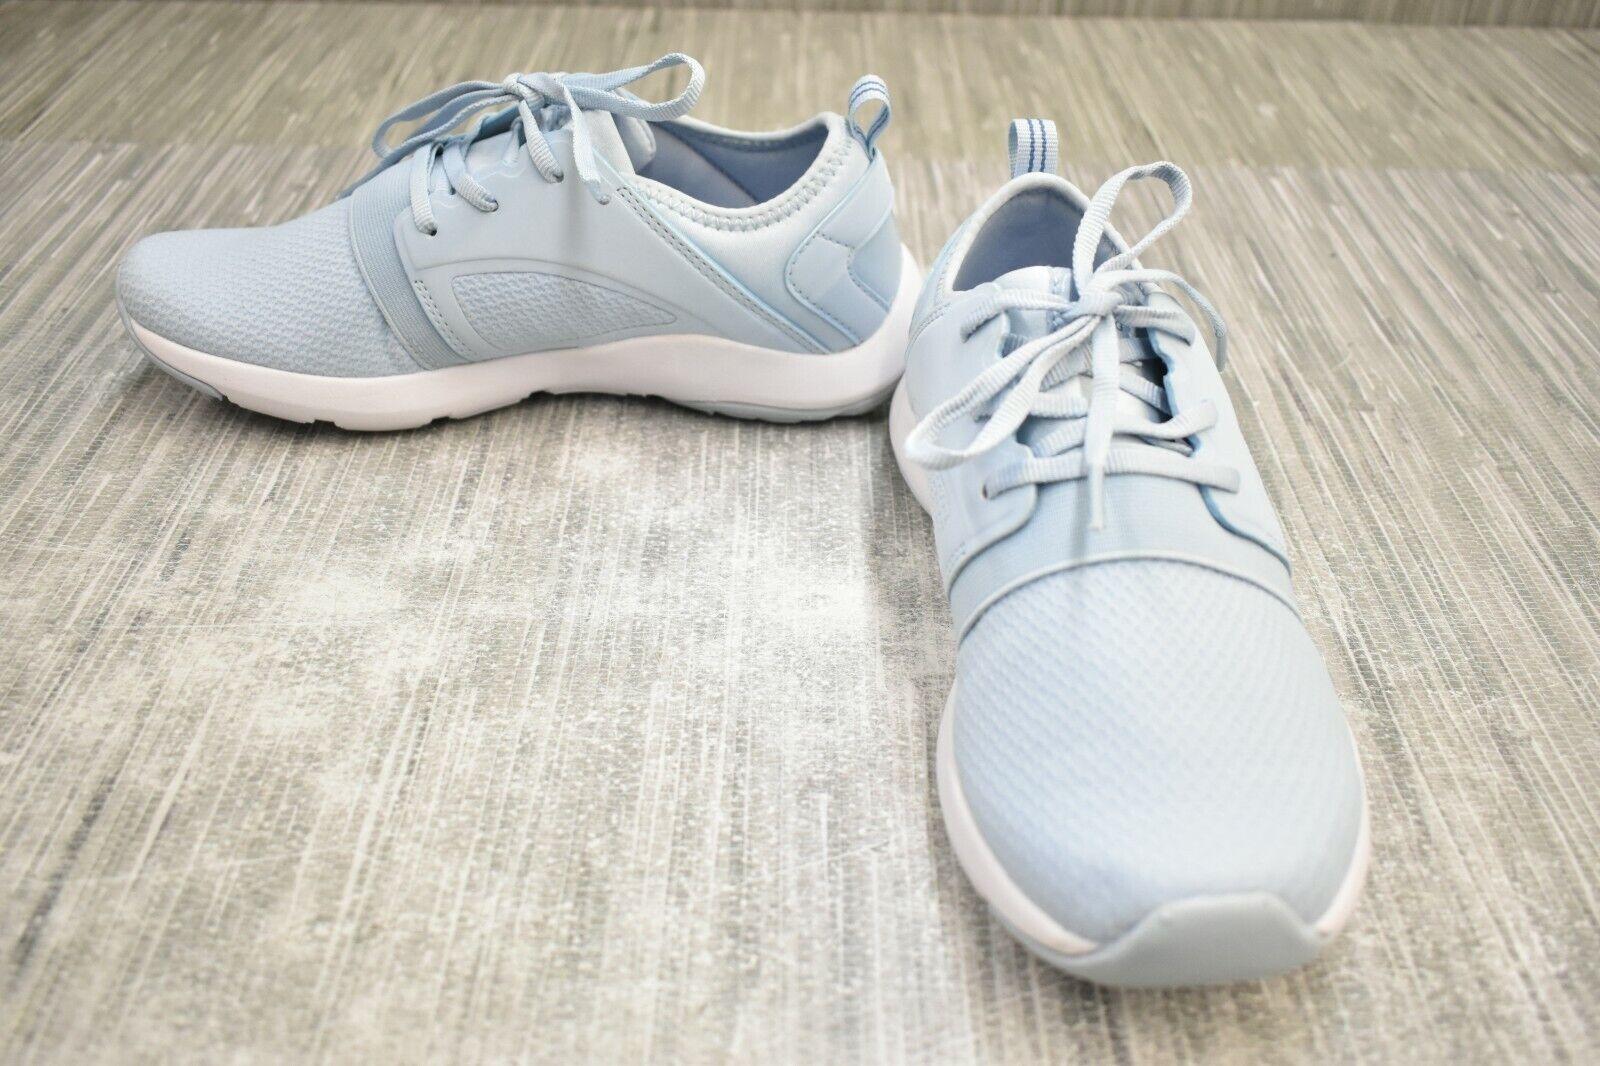 Ryka Eva NRG Training Shoes Women's